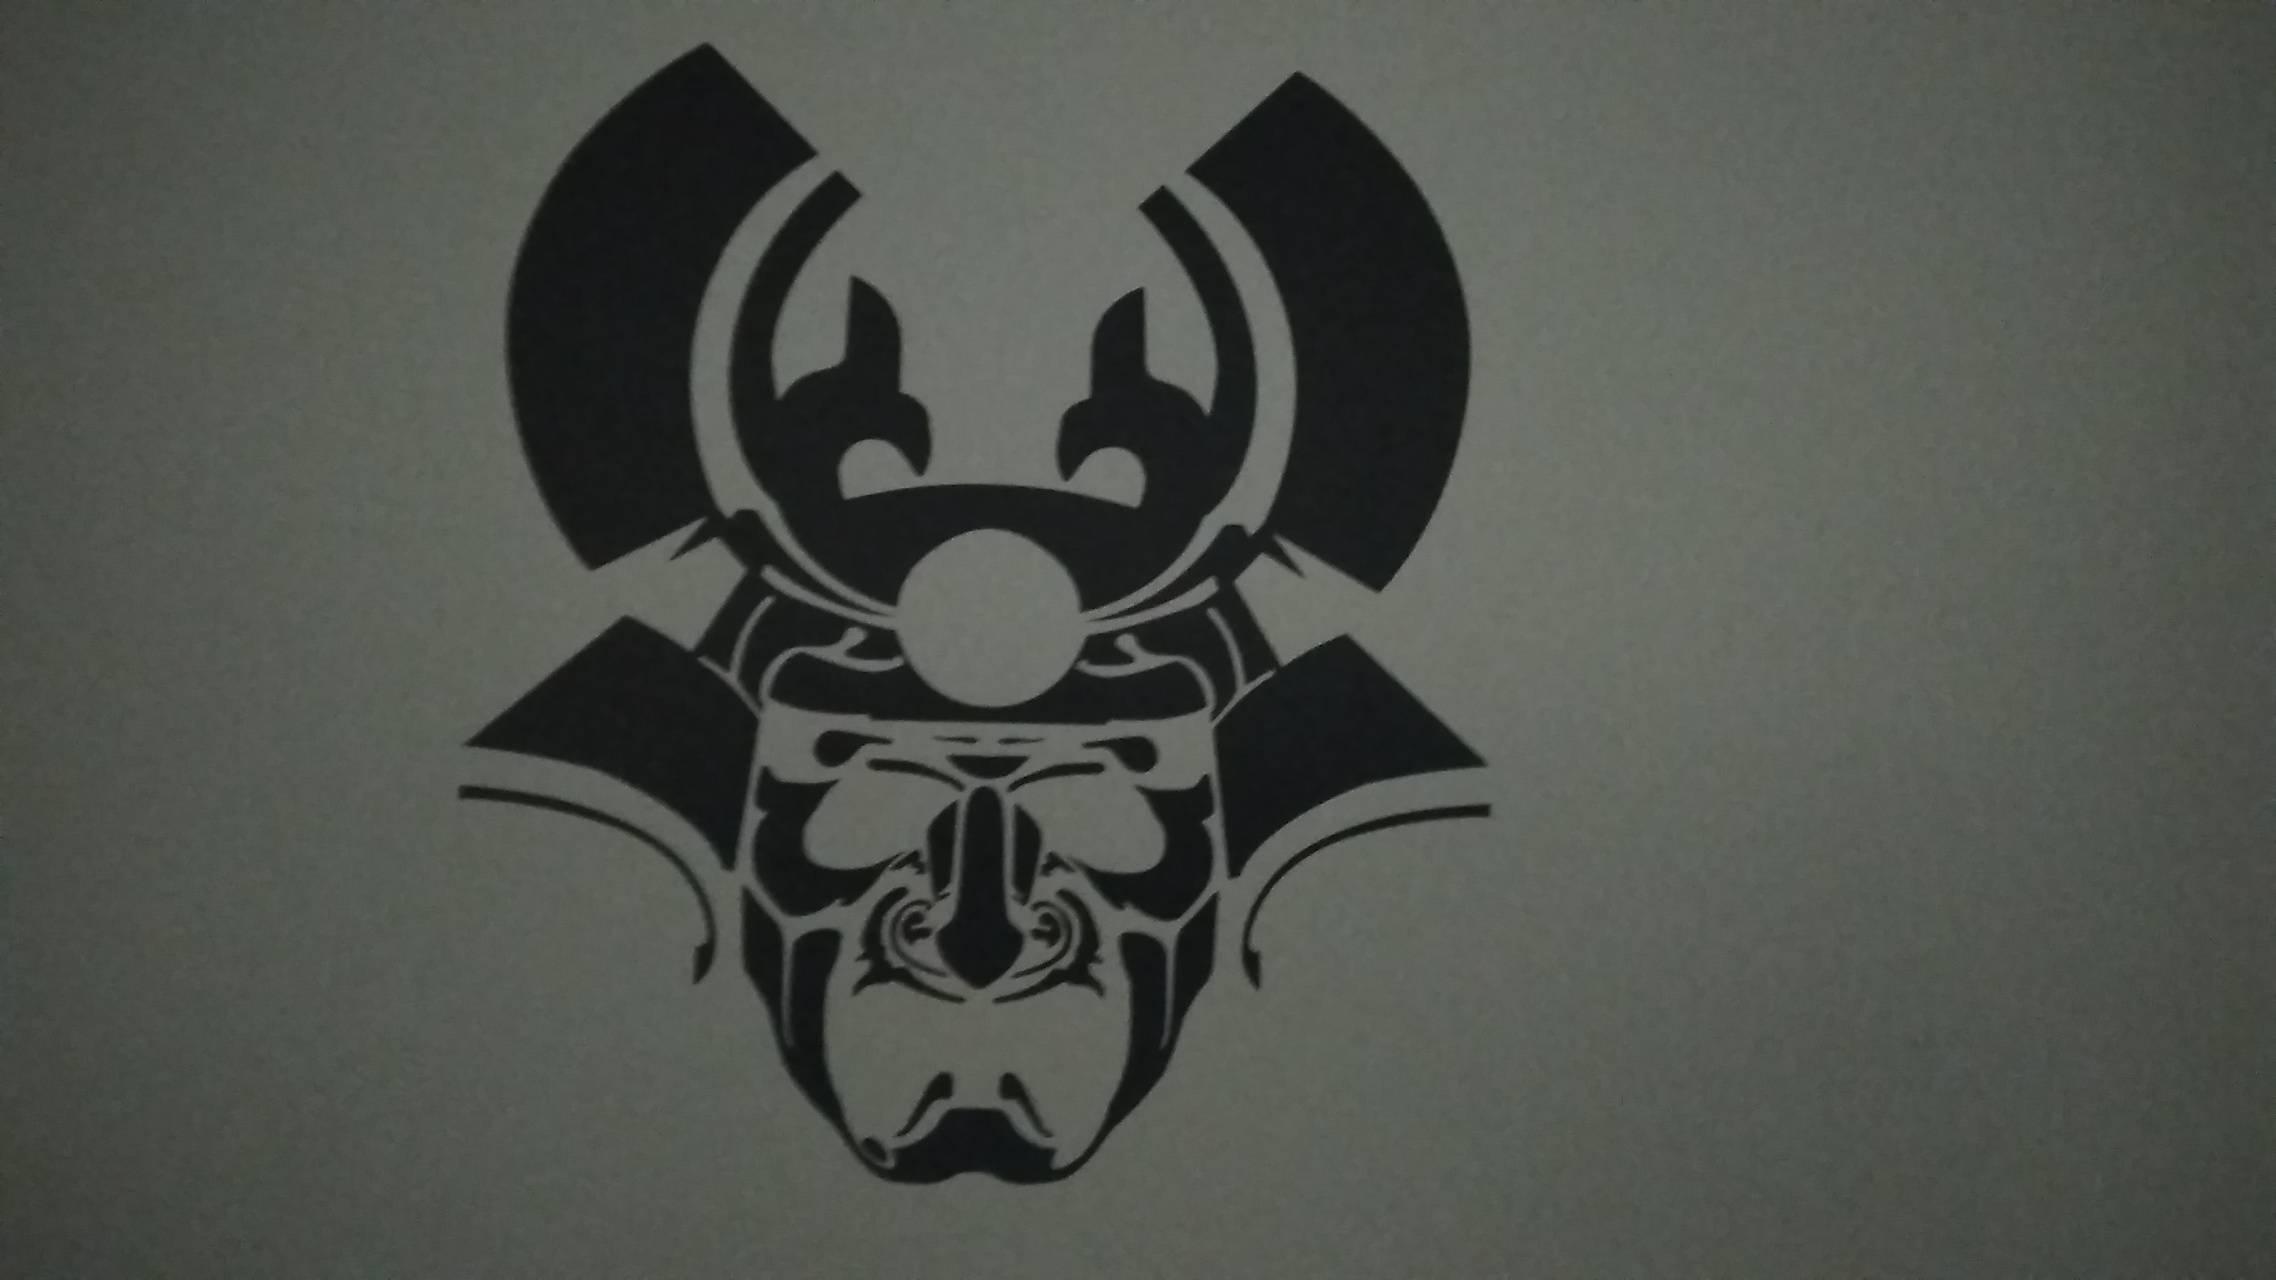 Samurai face 2